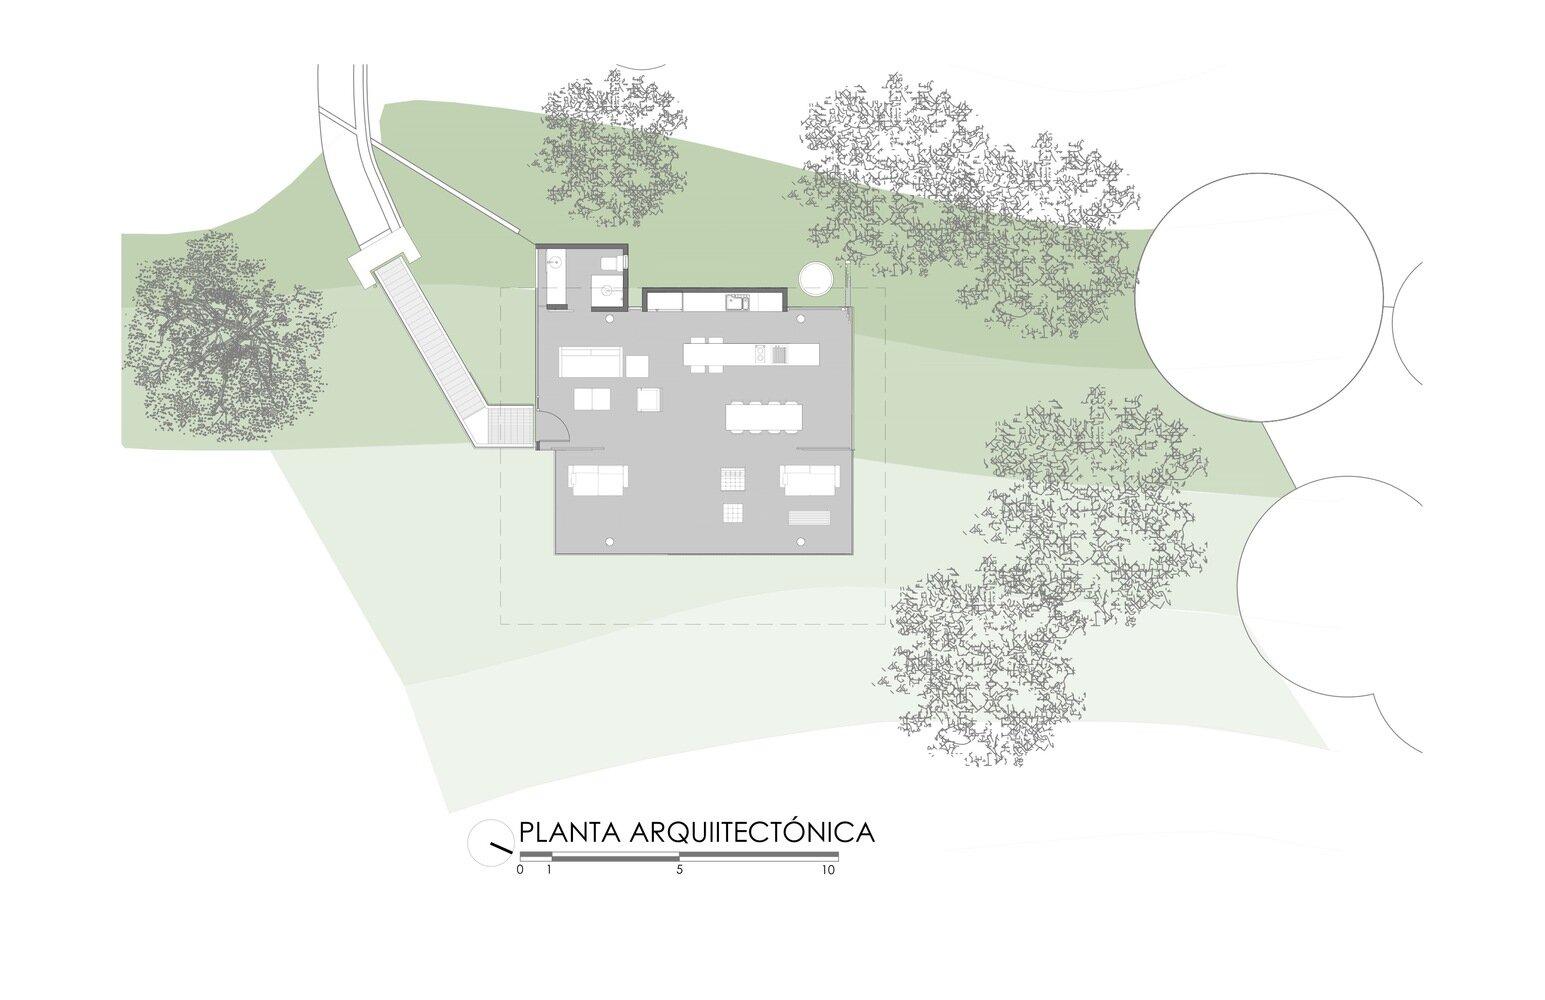 Room-and-Ficus-Cañas-Arquitectos-Costa-Rica-Floor-Plan-Humble-Homes